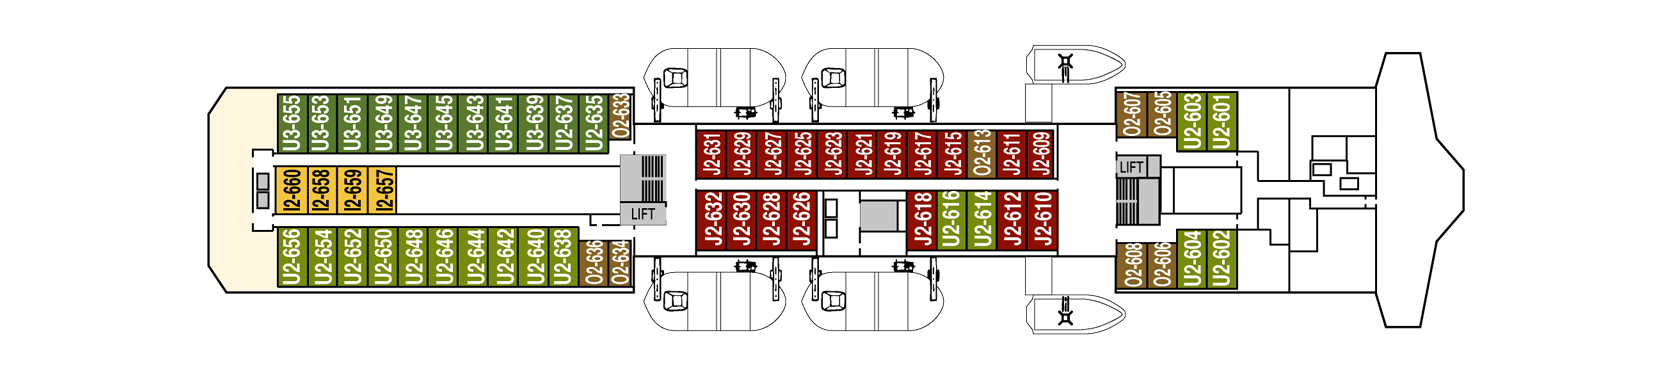 Hurtigruten MS Kong Harald Deck Plans Deck 6.png